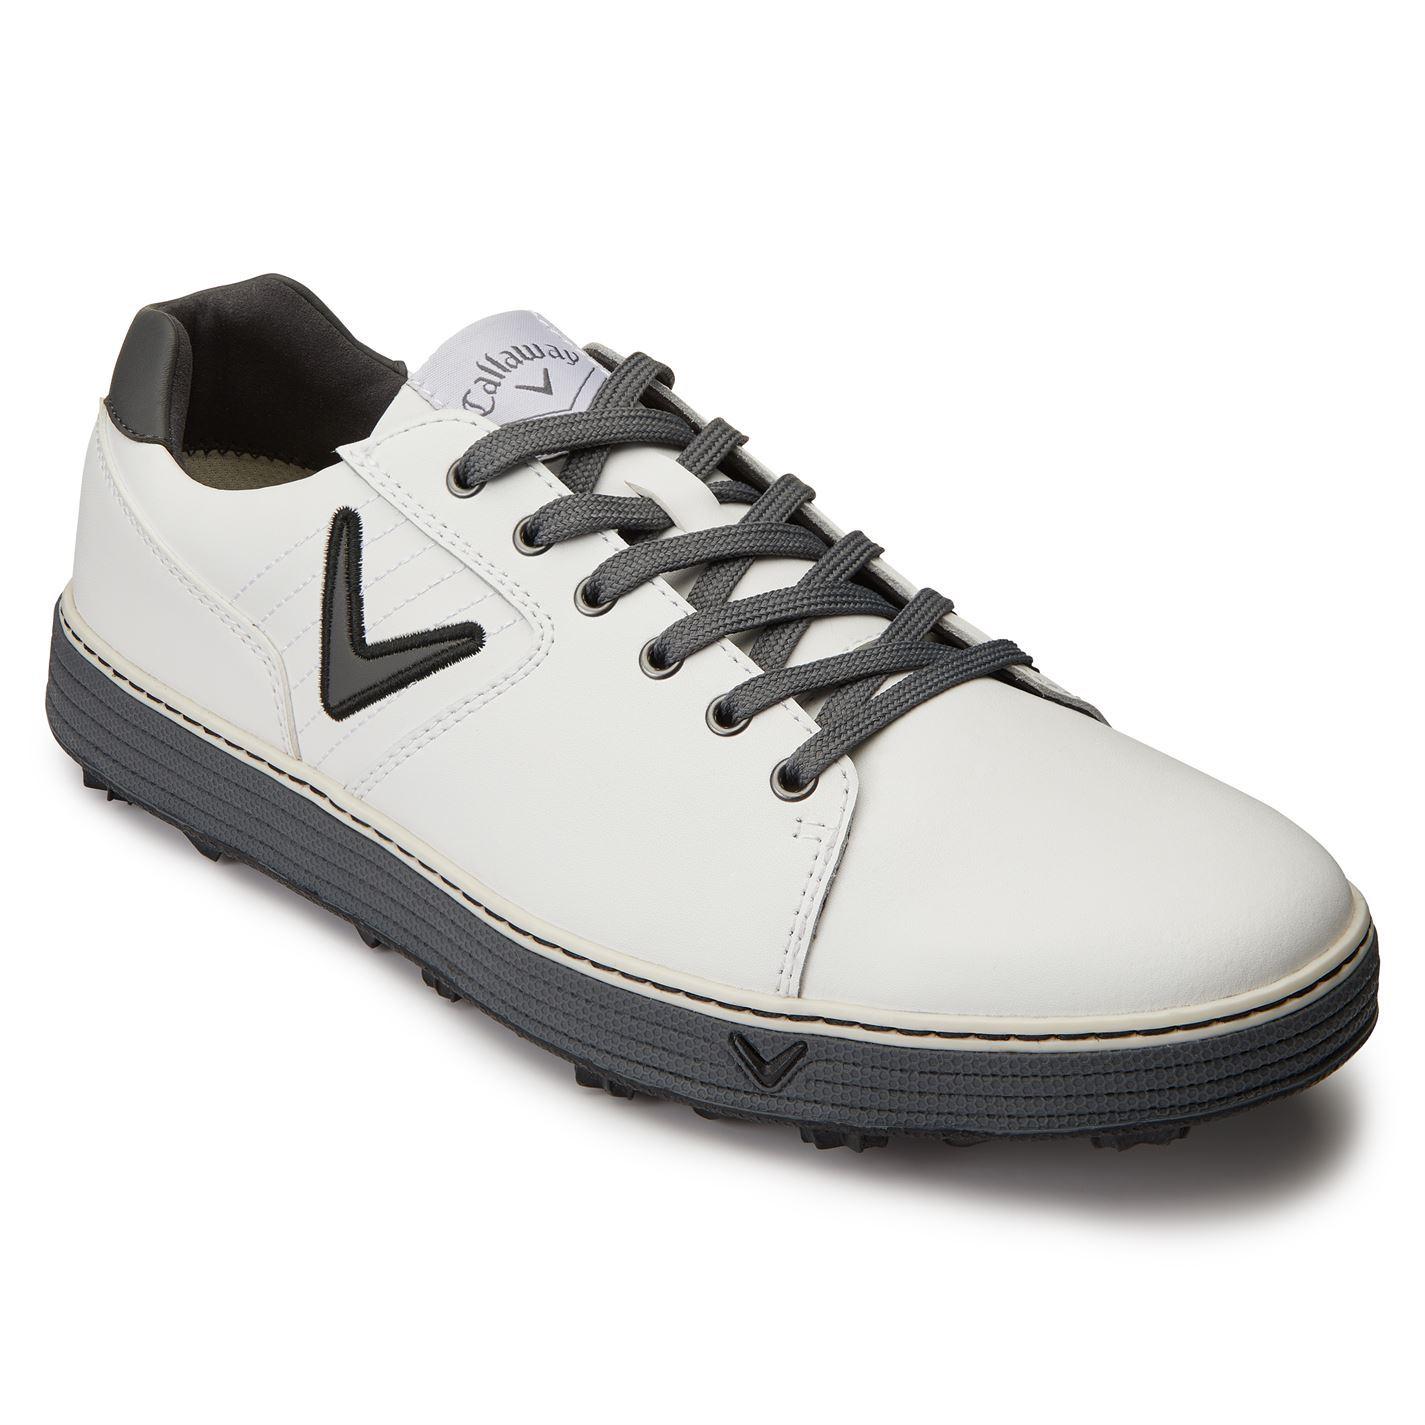 Callaway-Delmar-Urban-Golf-Shoes-Mens-Spikeless-Footwear thumbnail 13